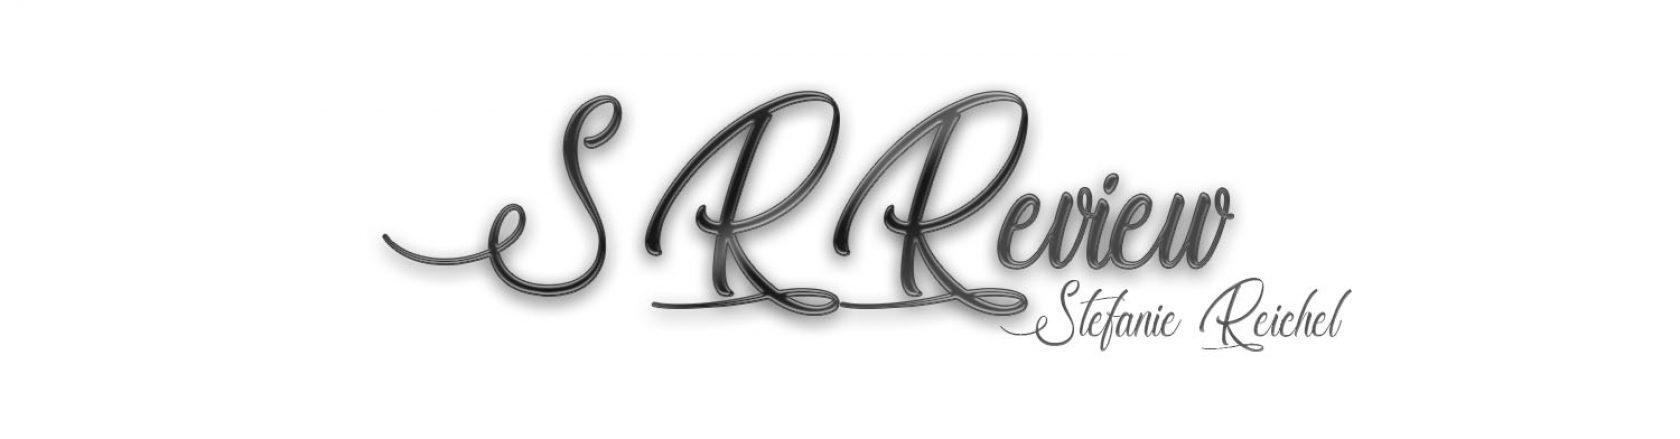 SR-Review